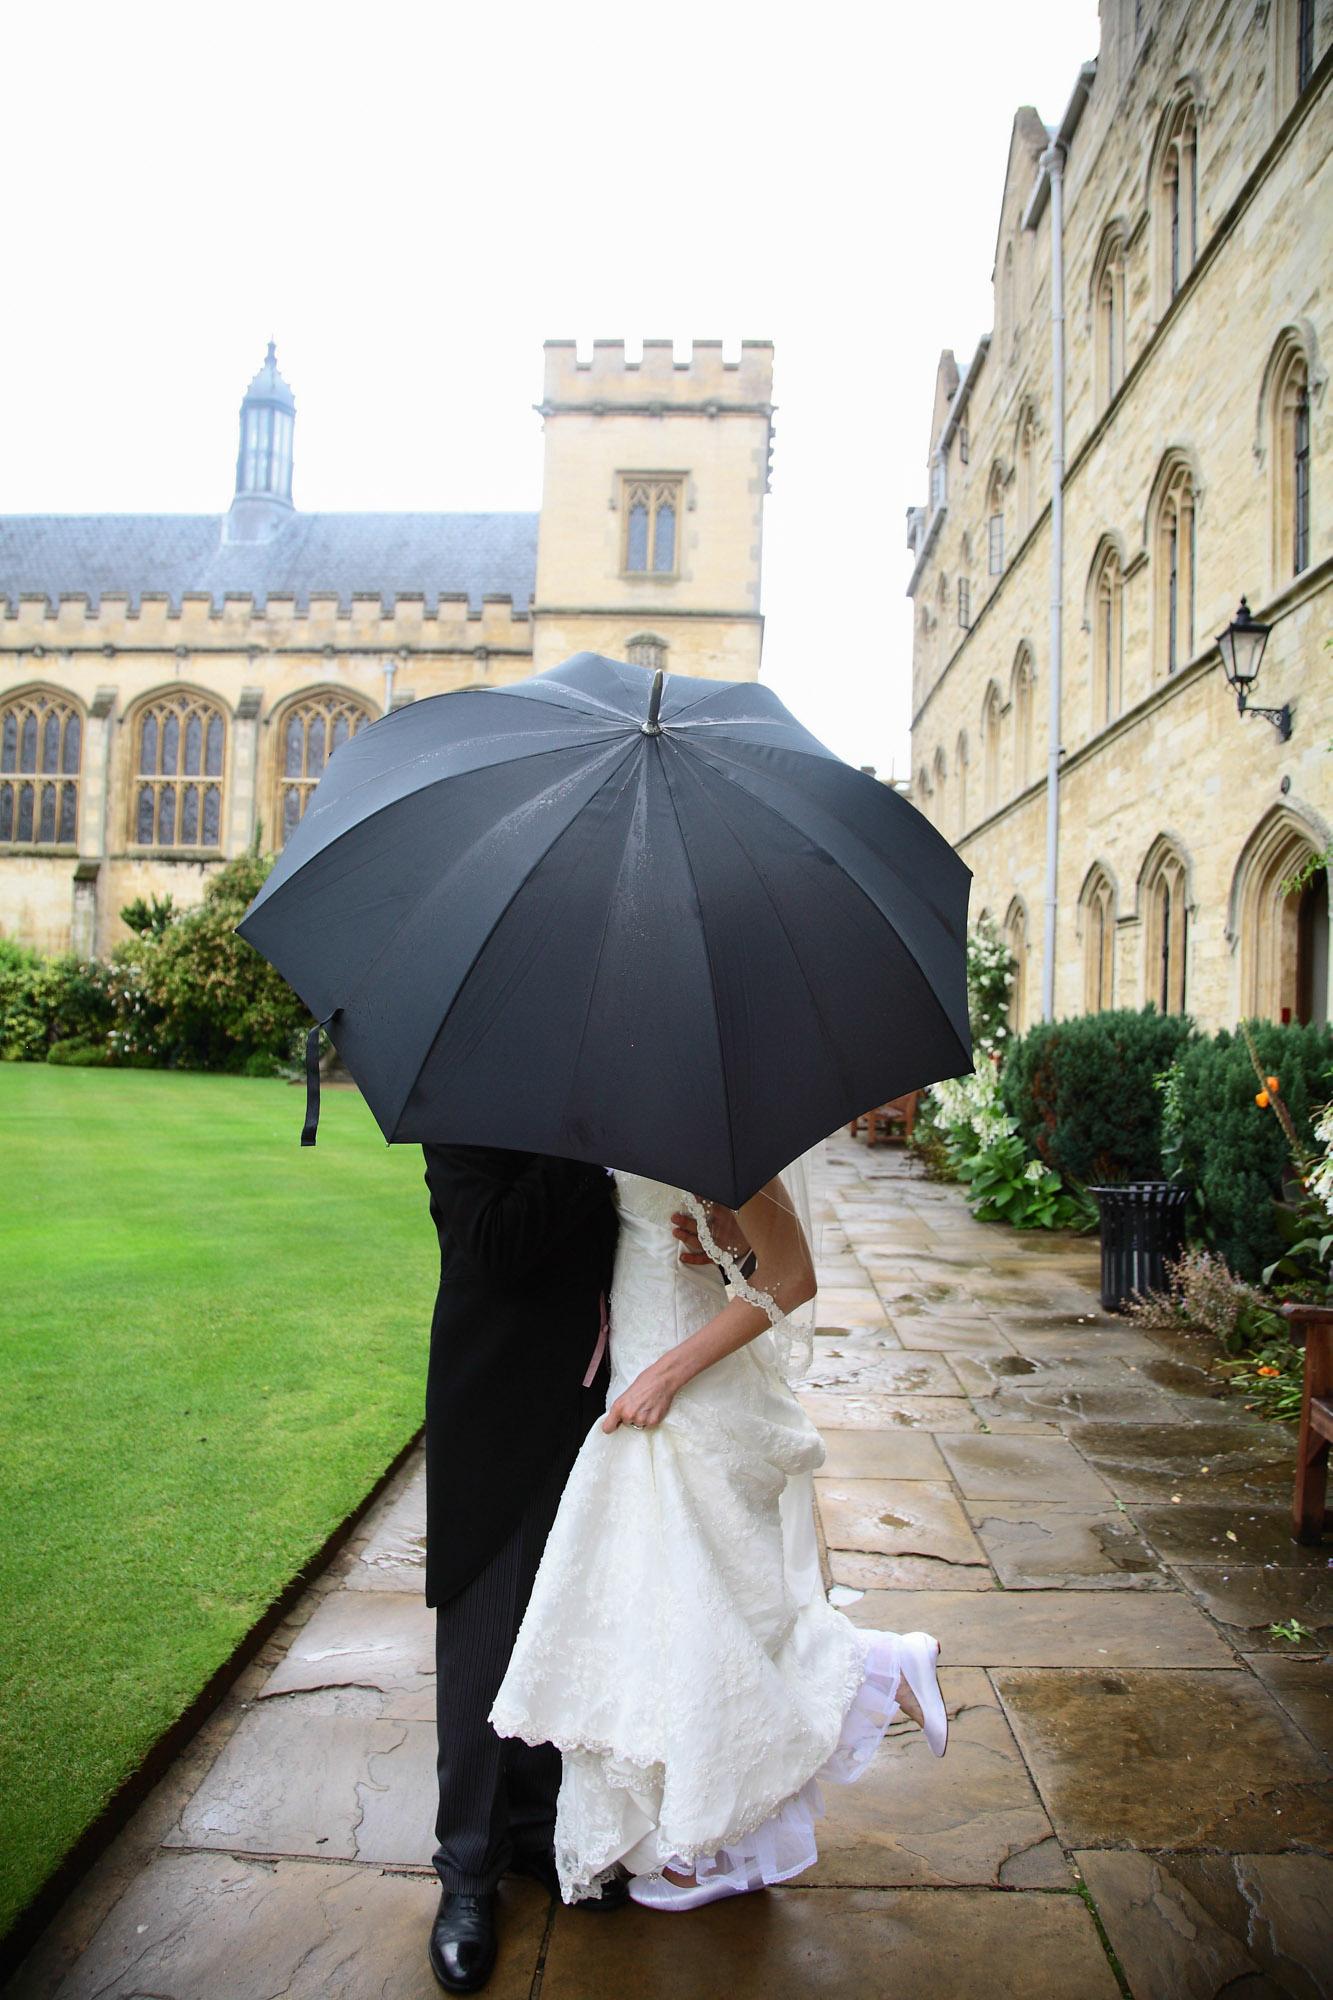 weddings-couples-love-photographer-oxford-london-jonathan-self-photography-90.jpg